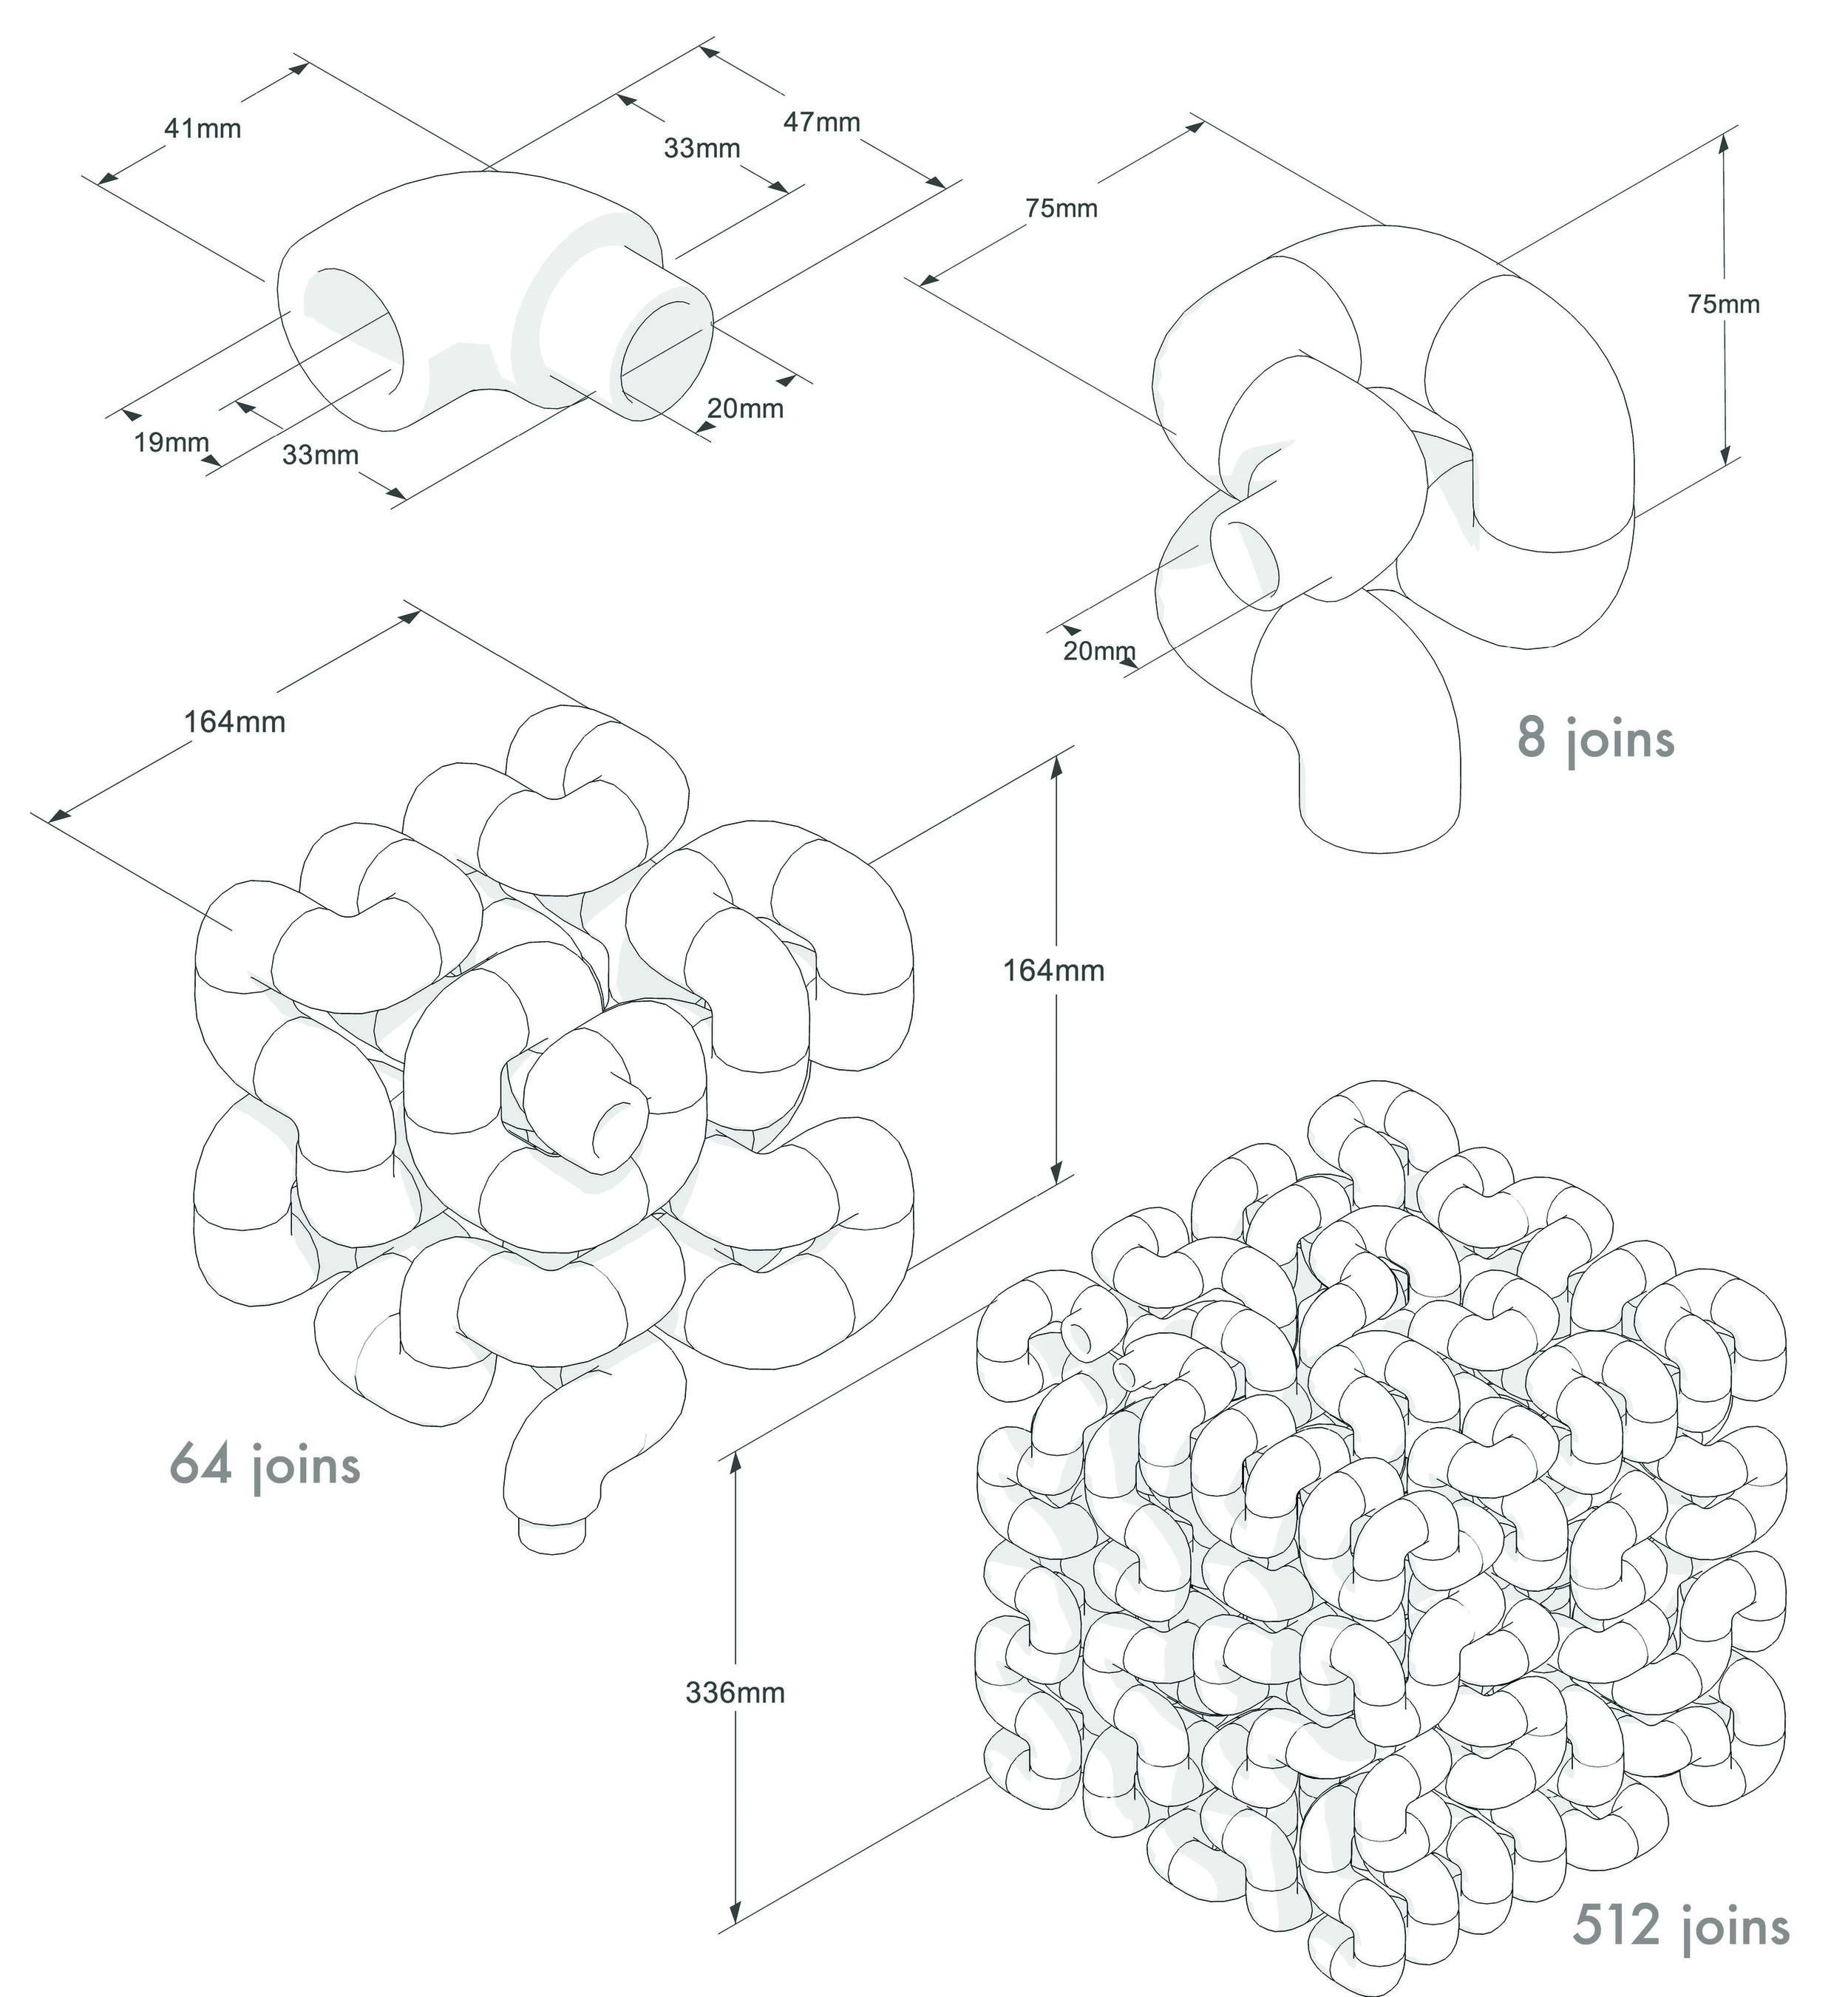 Octocube radiator assembly method